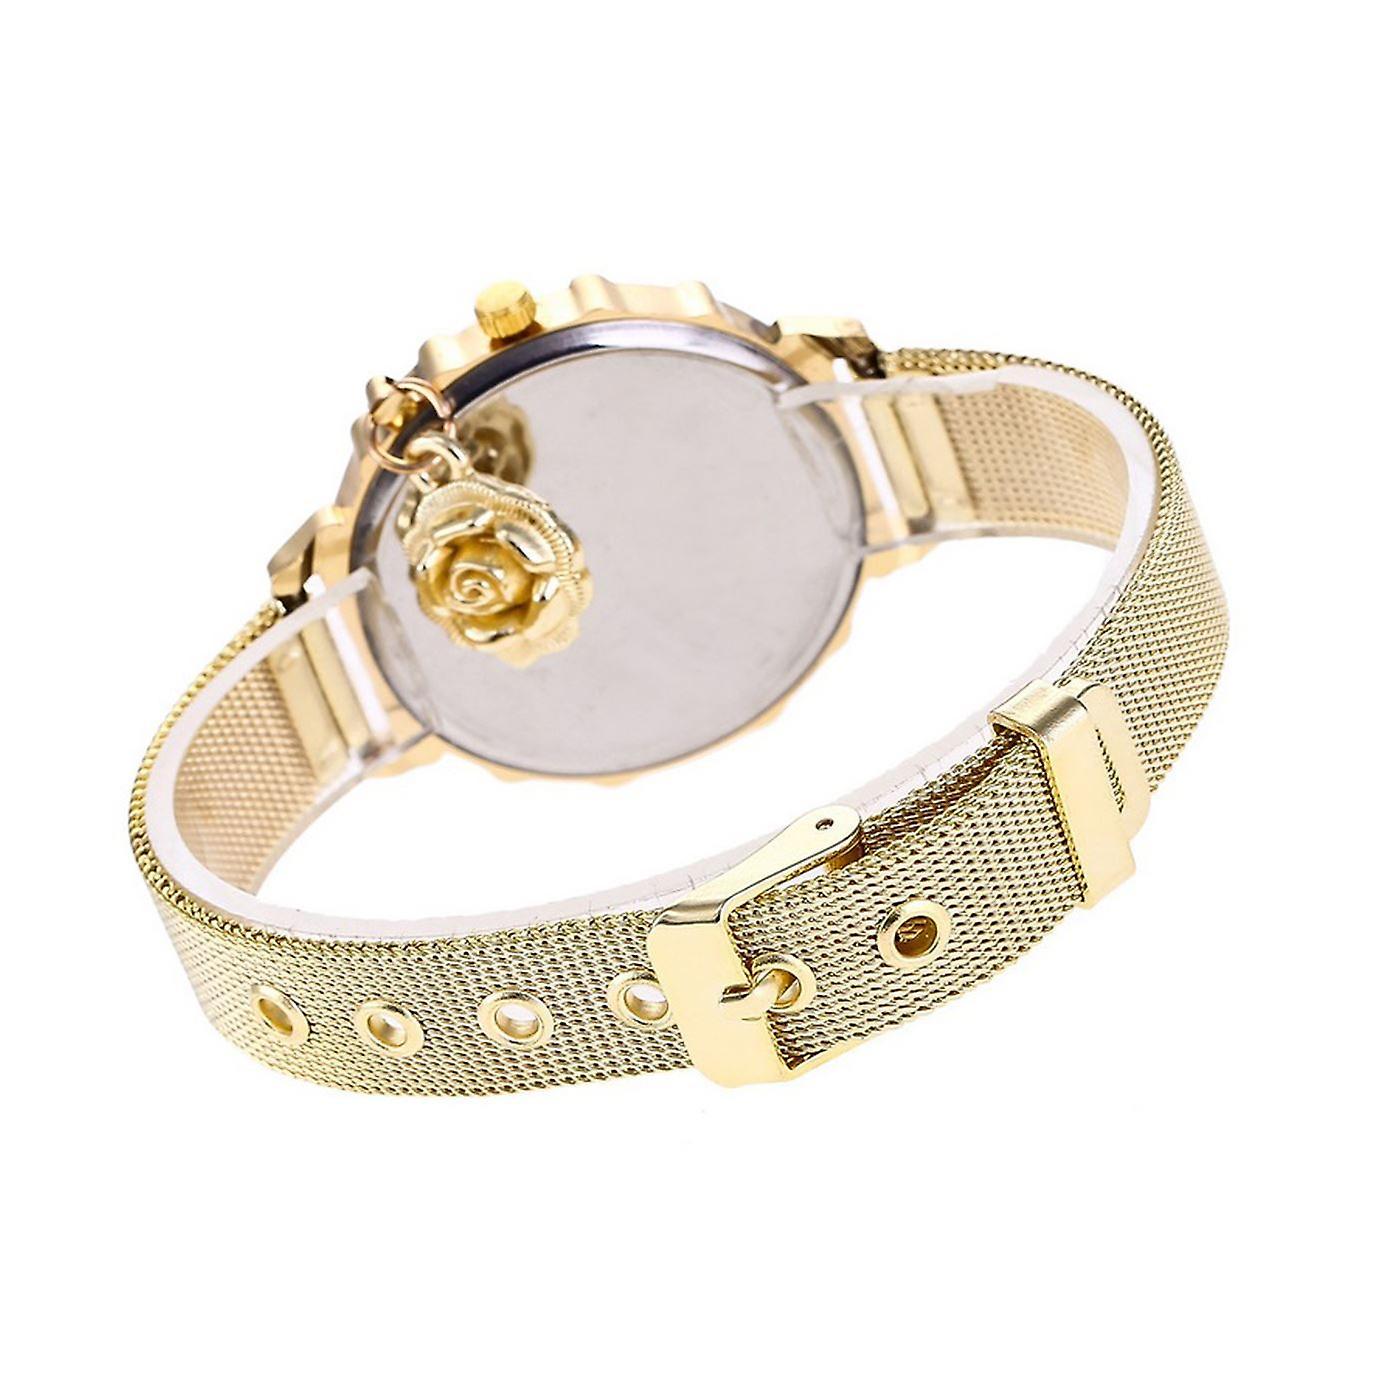 Classy Yellow Gold Flower Watch Luxury Stones Elegant Time GOLD Mesh Bracelet